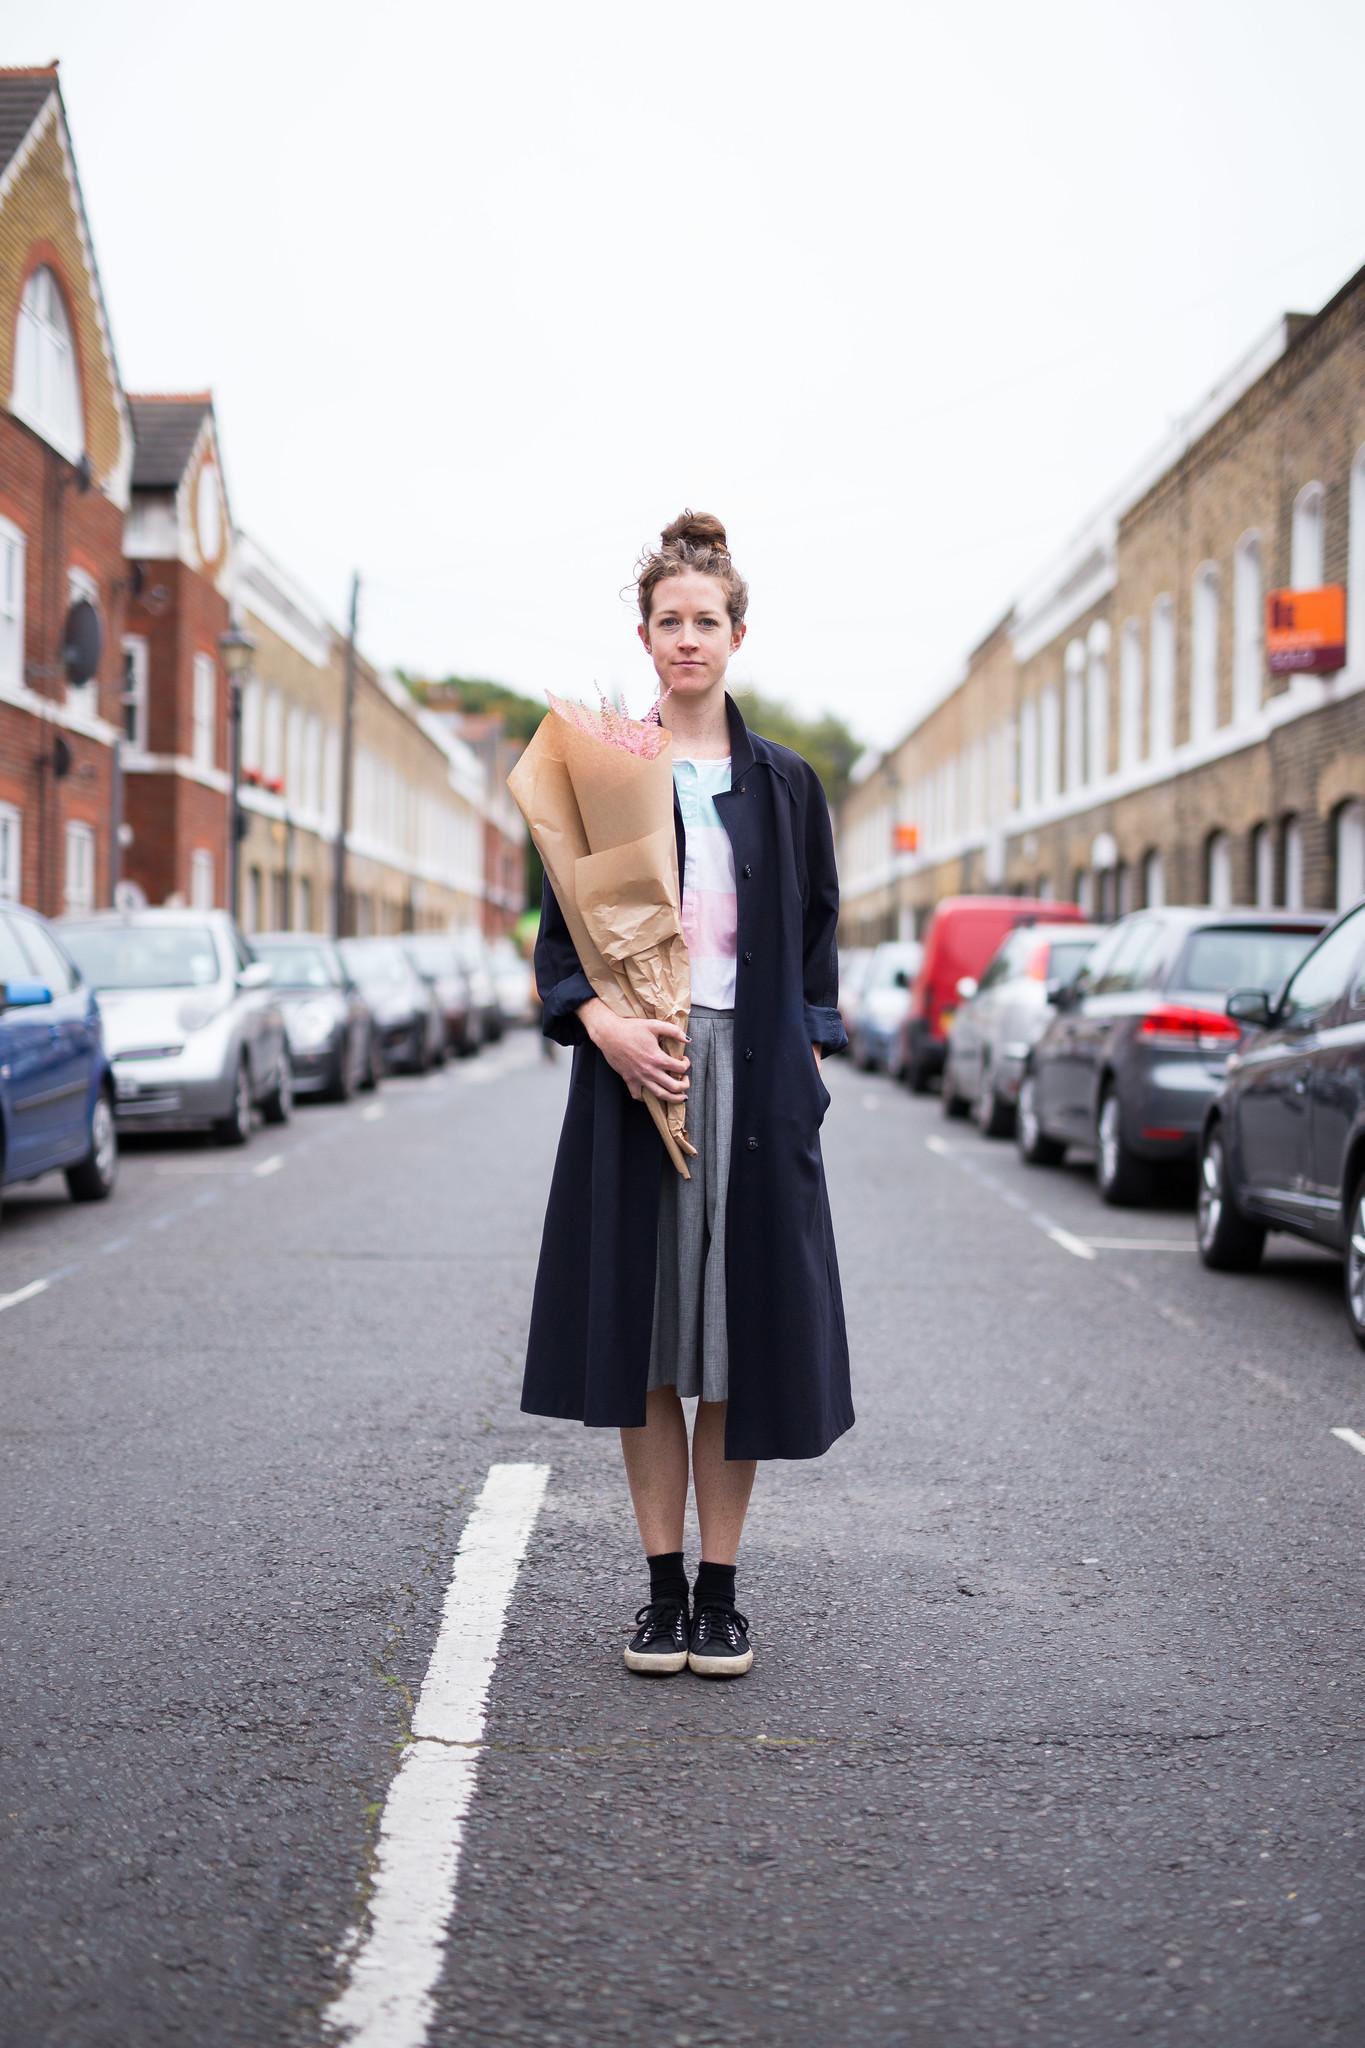 Street Style - Erin, Baxendale Street